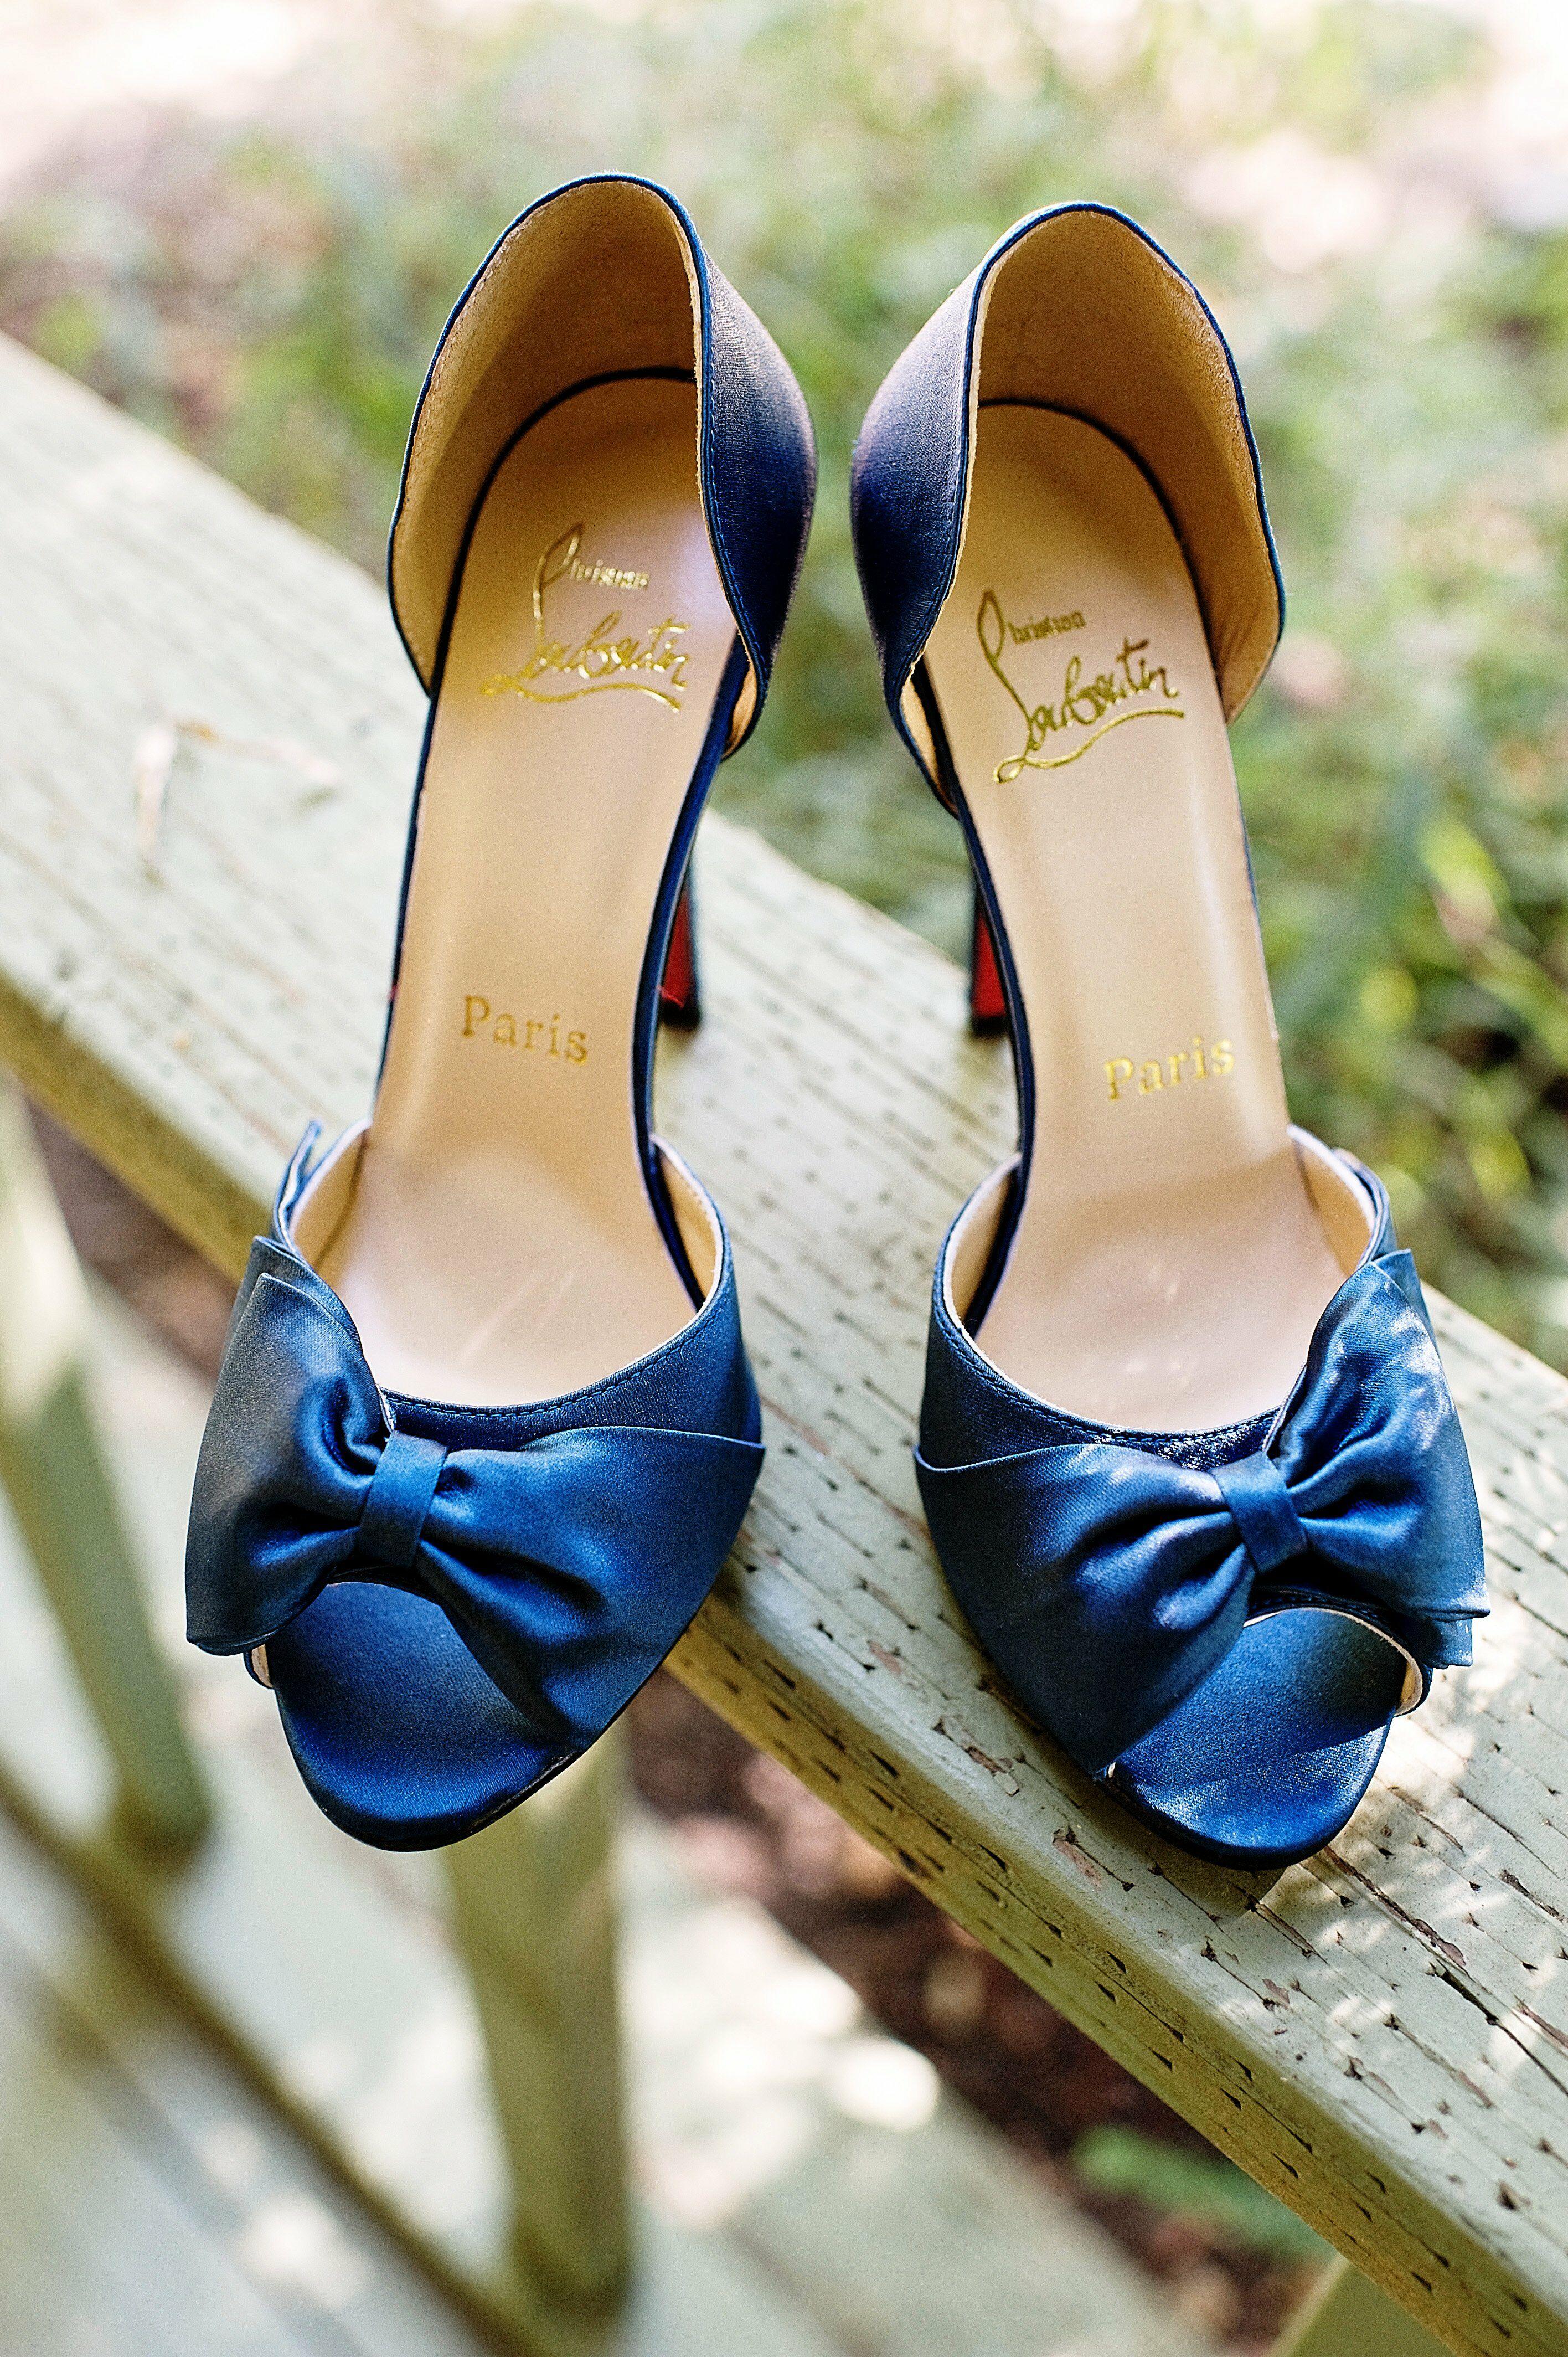 Blue Christian Louboutin Bridal Shoes